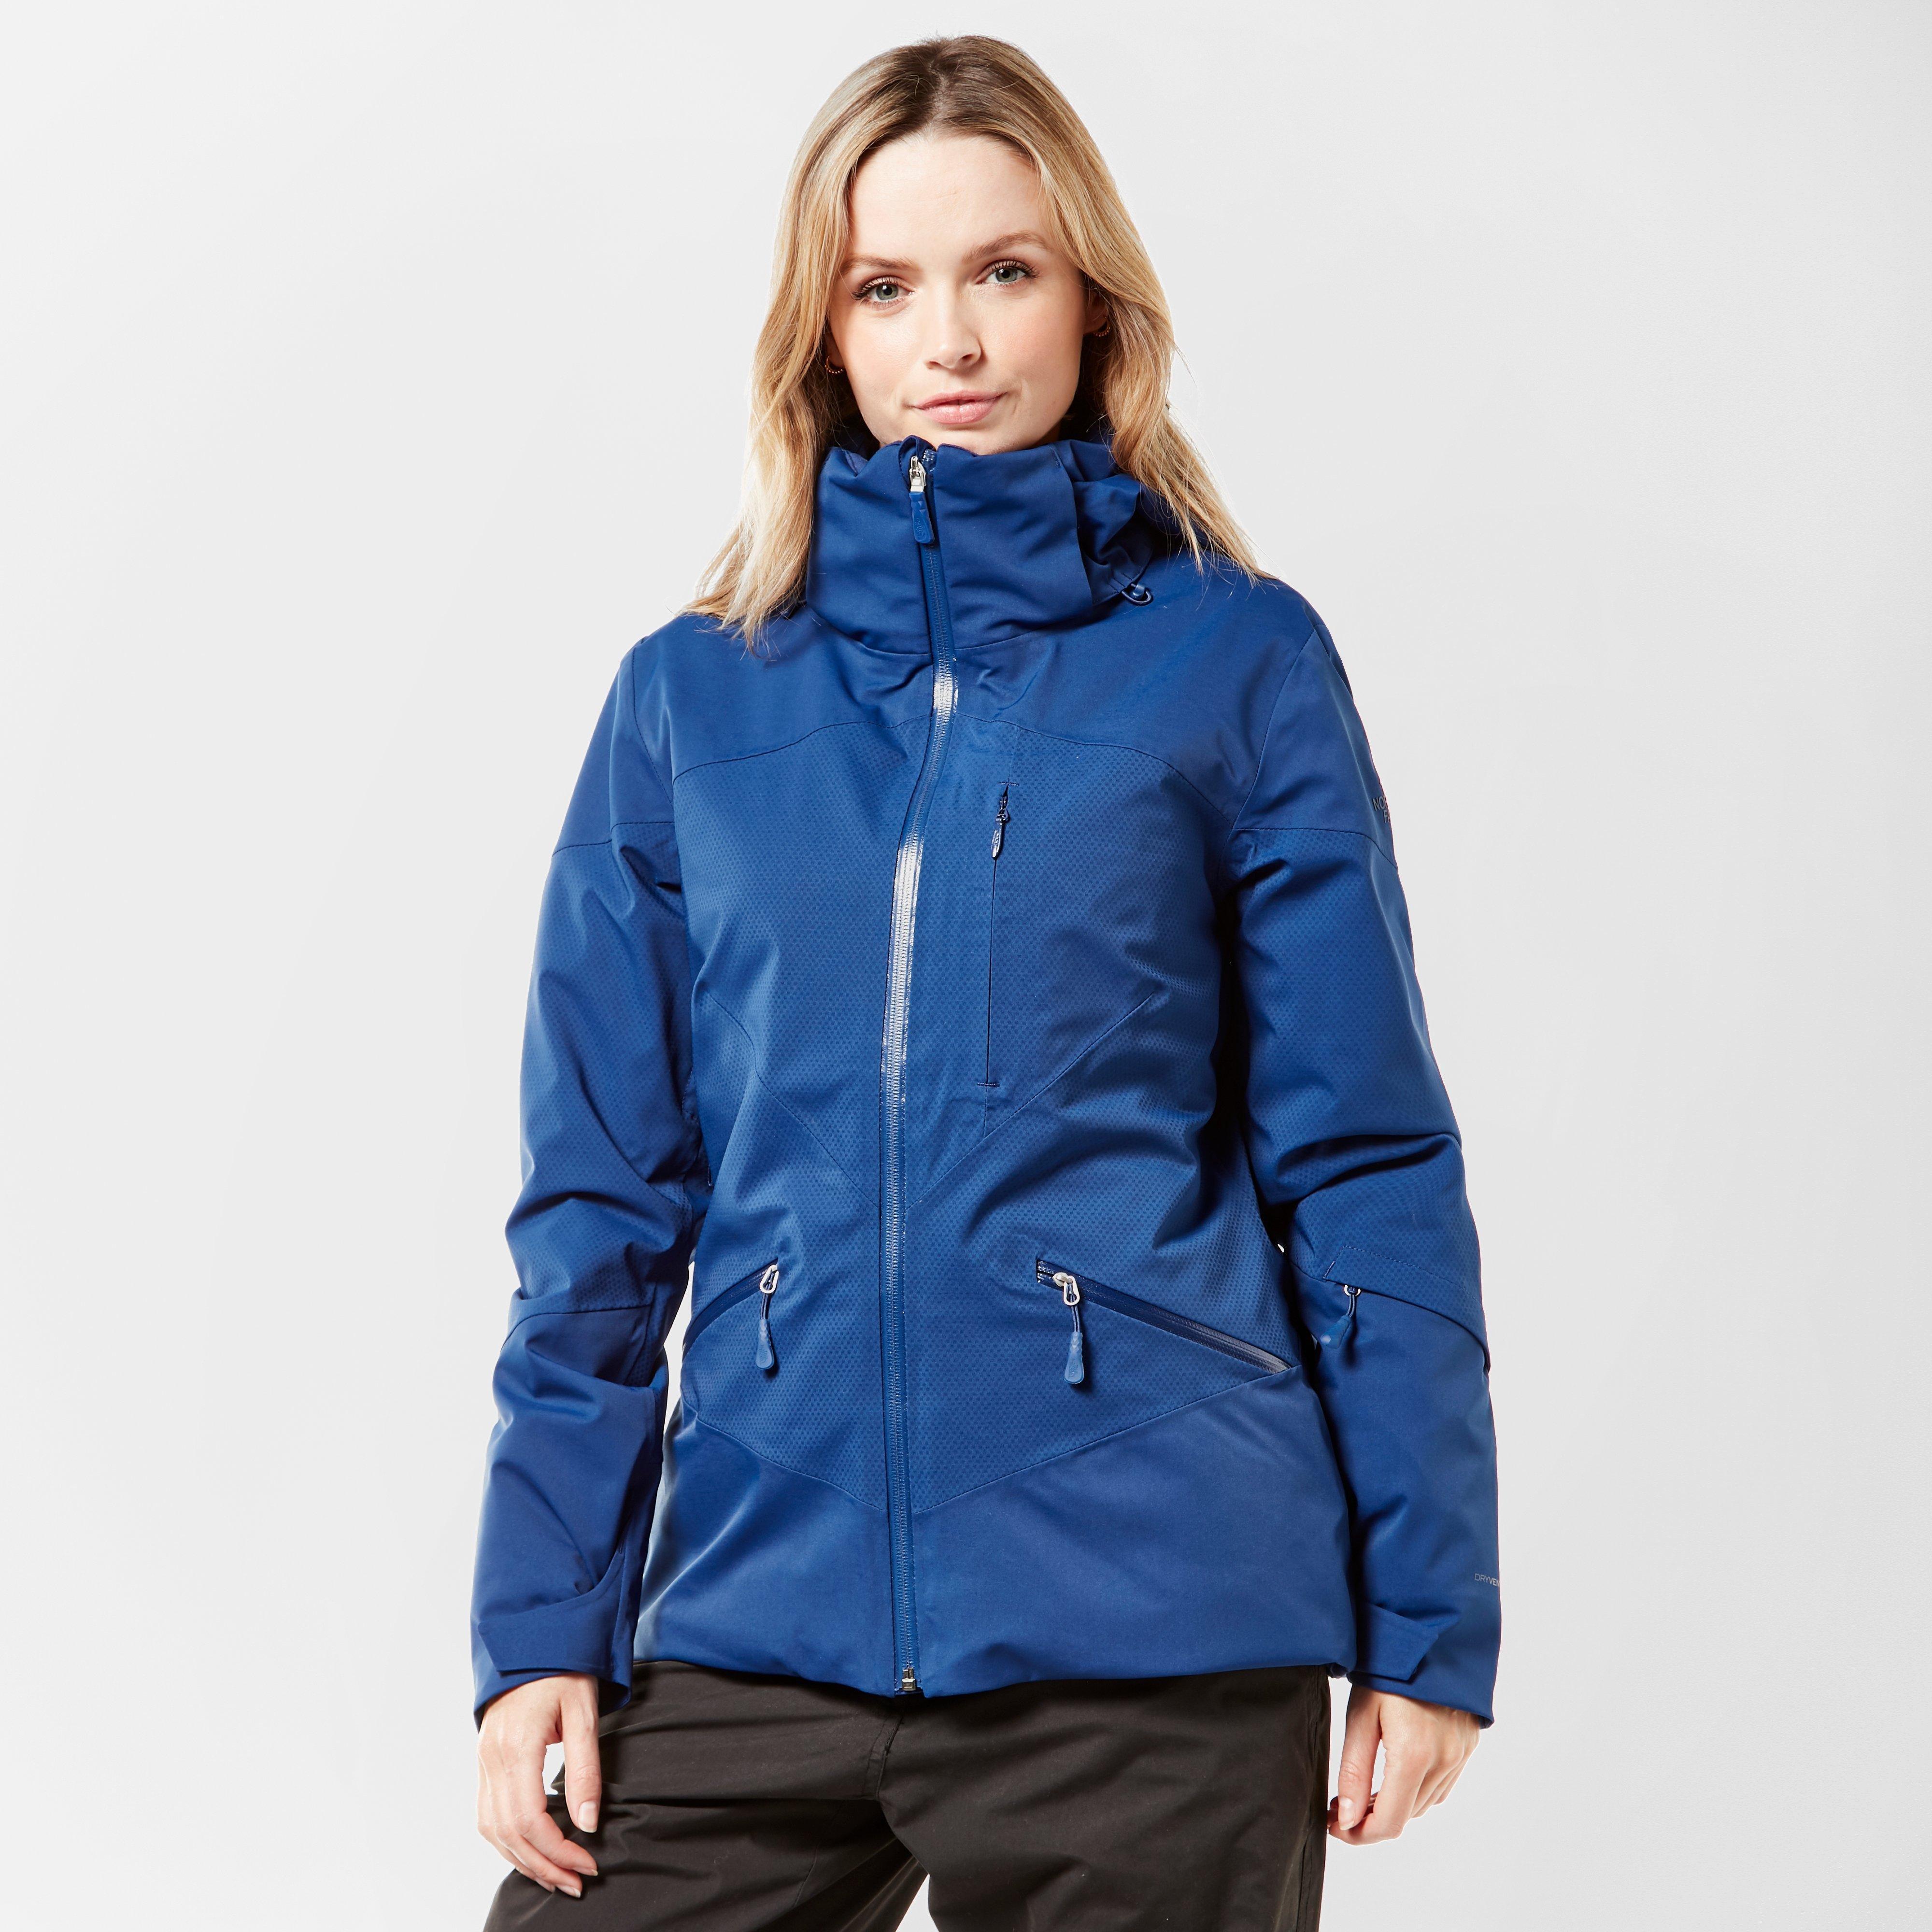 The North Face Women's Lenado Jacket - Blu/Blu, Blue